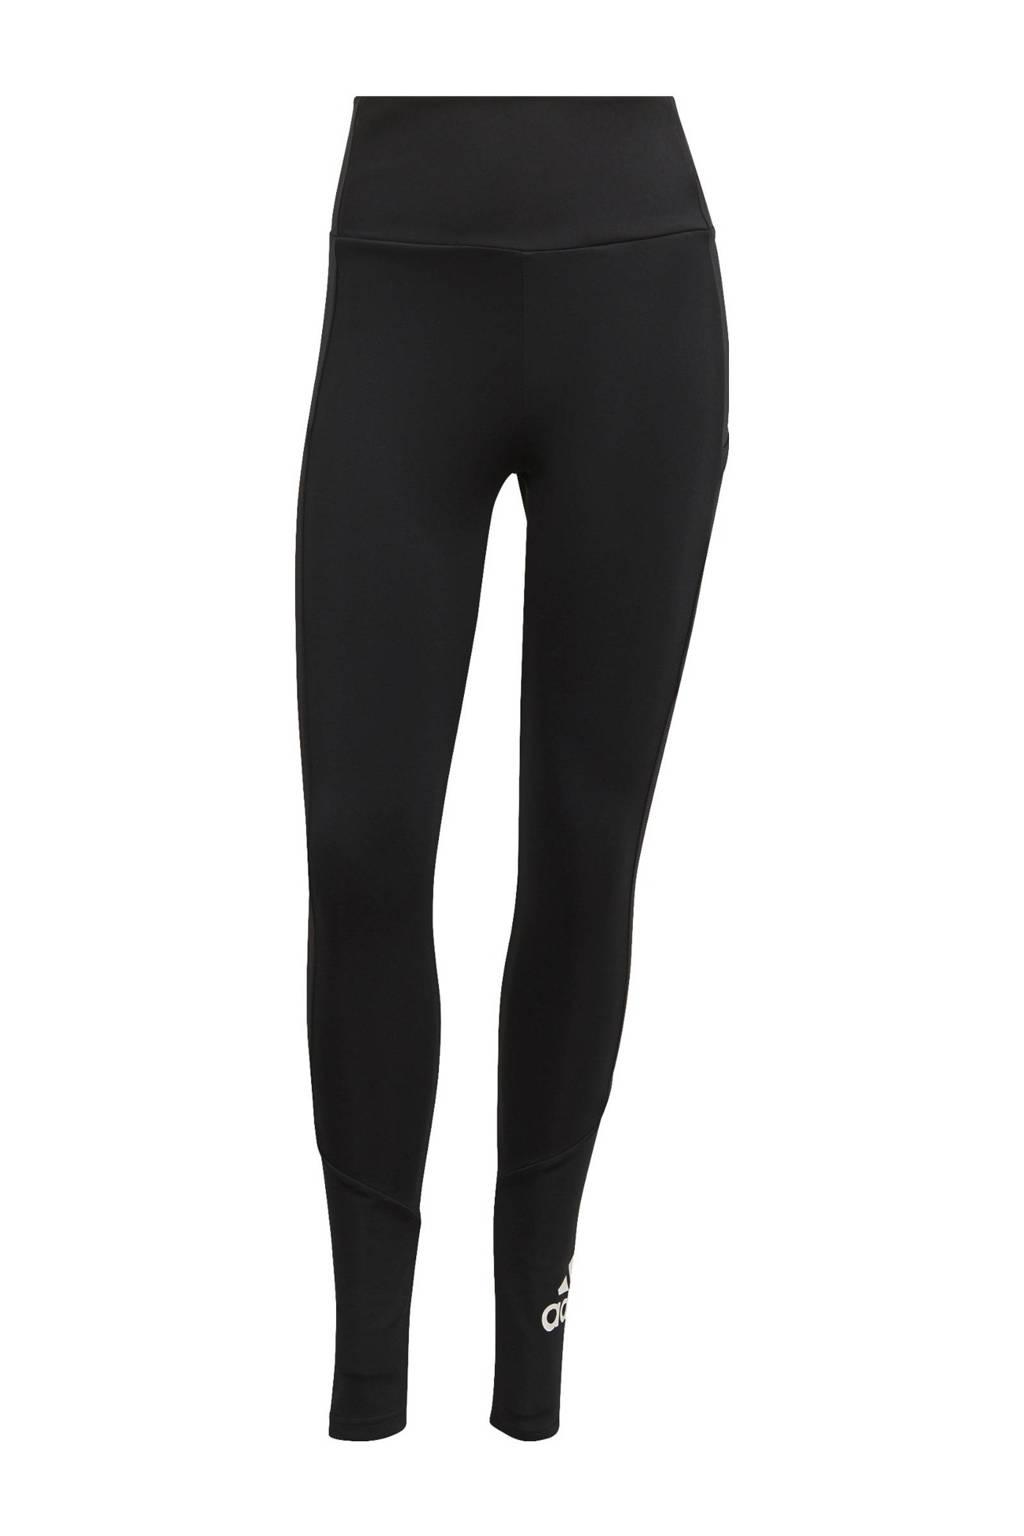 adidas Performance Designed2Move sportlegging zwart/wit, Zwart/wit